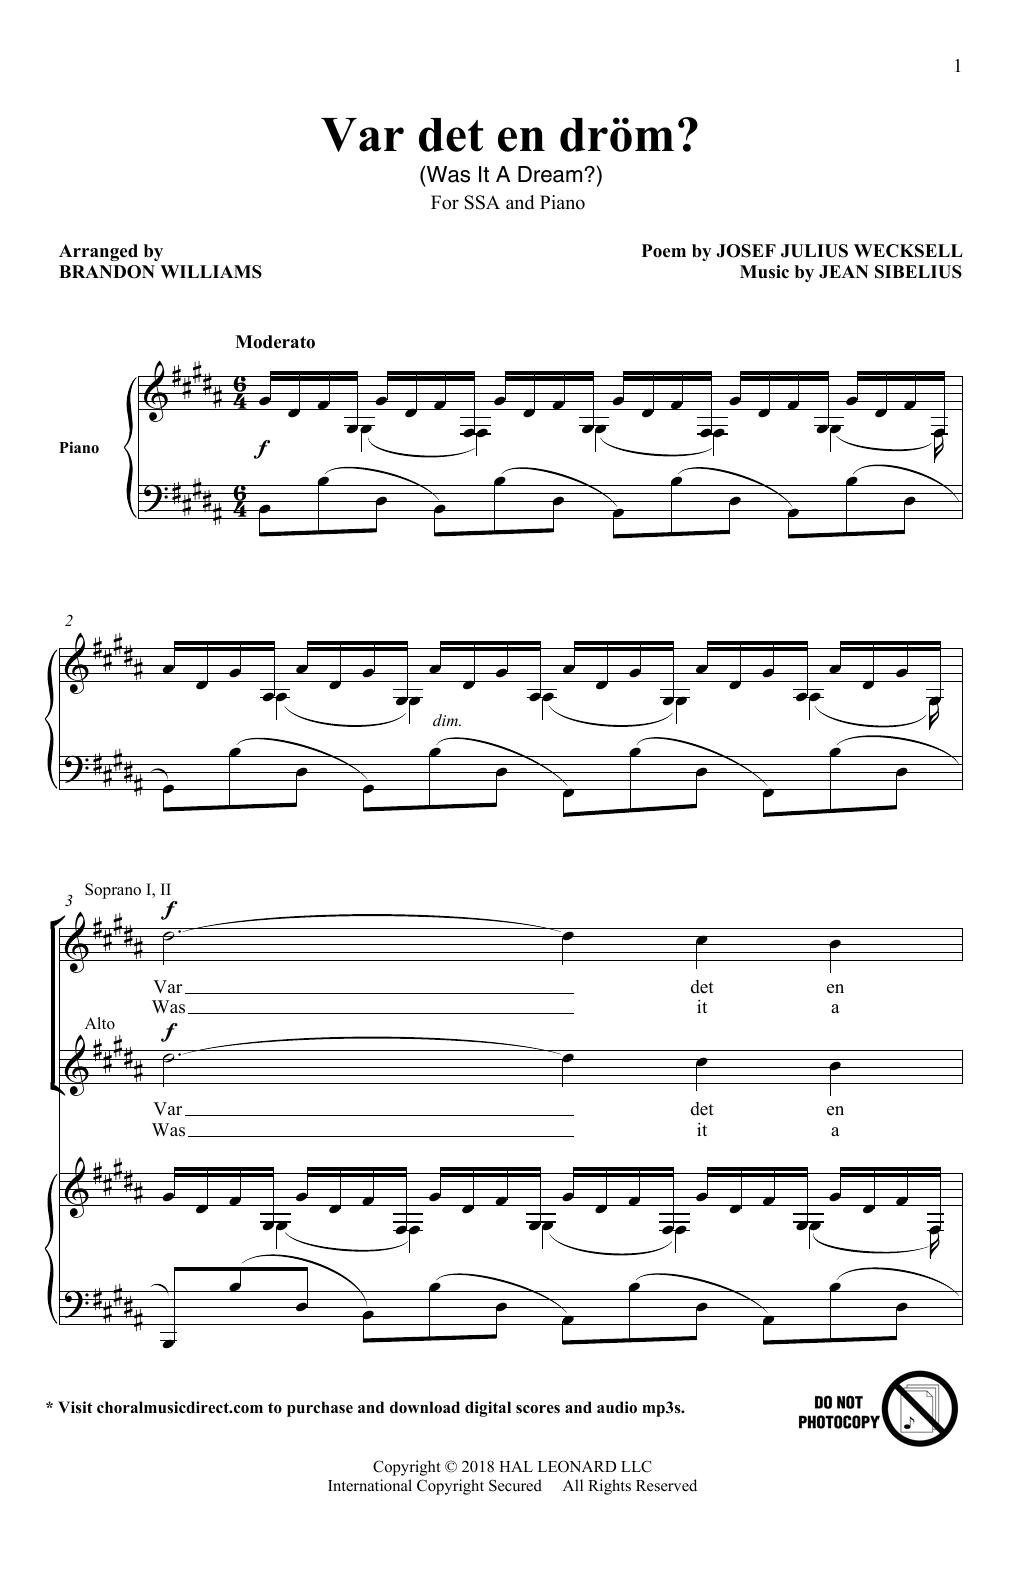 Brandon Williams Var Det En Drom? sheet music notes and chords